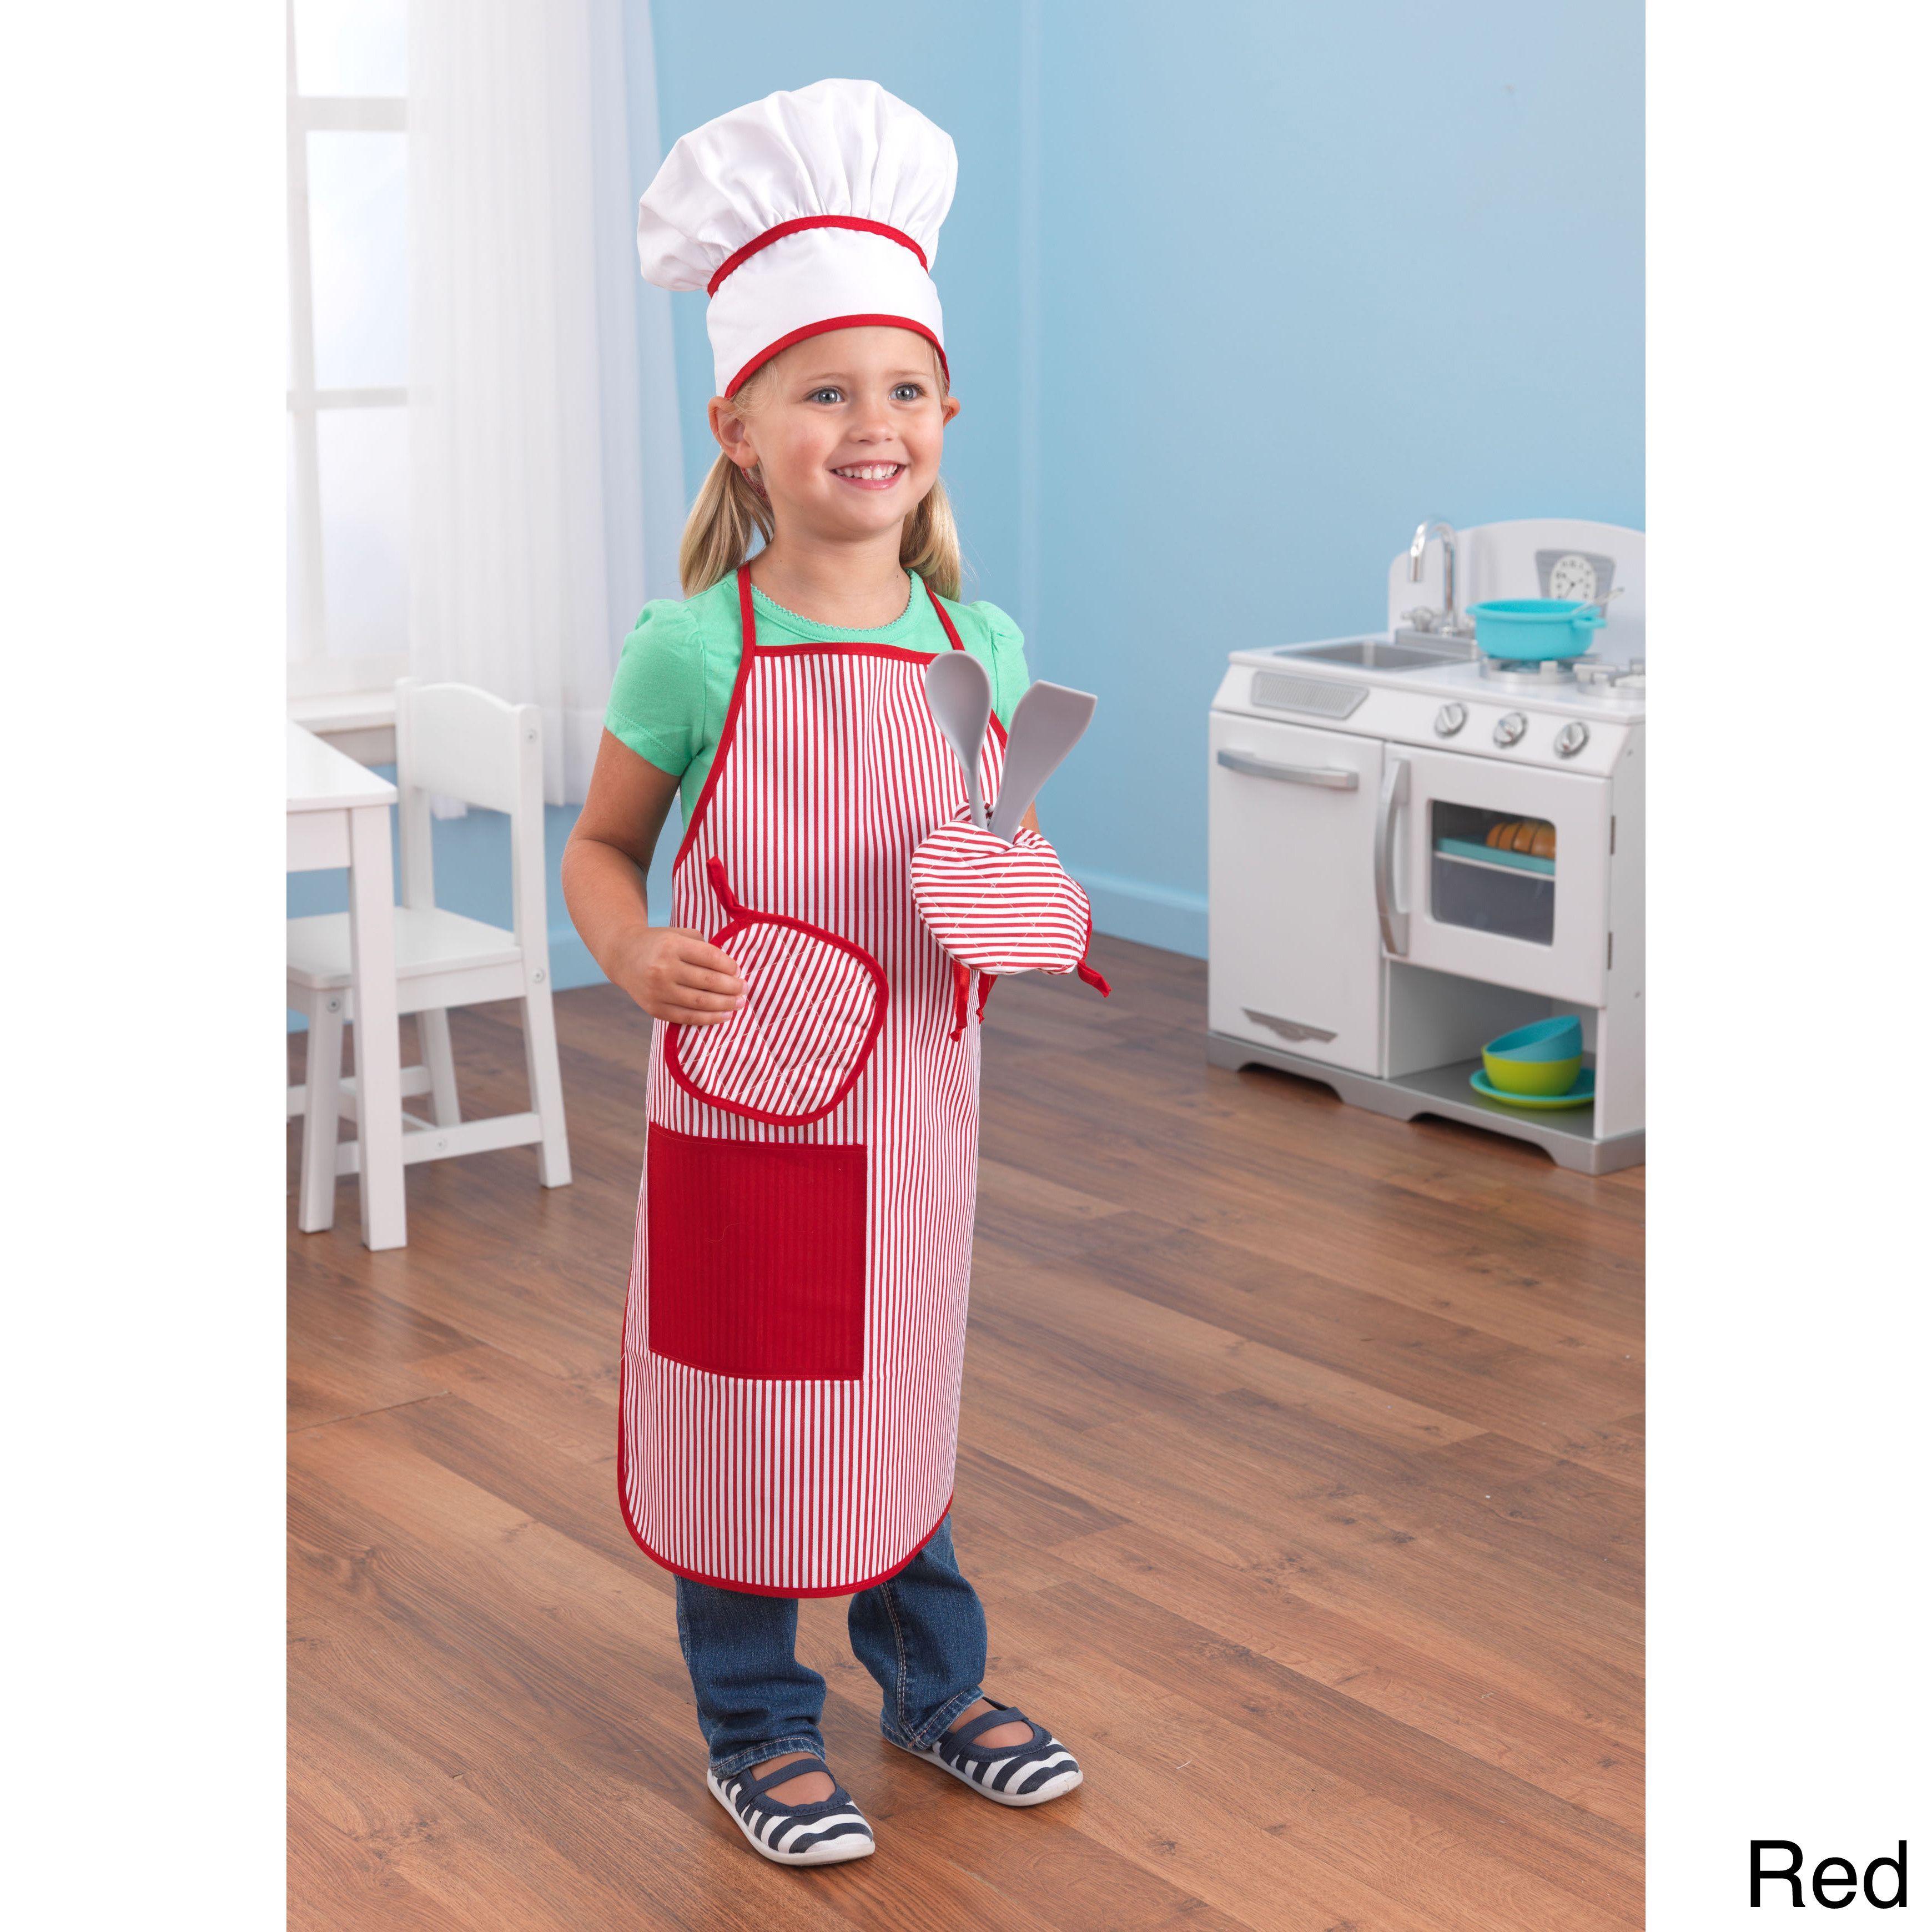 KidKraft Tasty Treats Chef Accessory Set Pink  Tasty Hobby shop